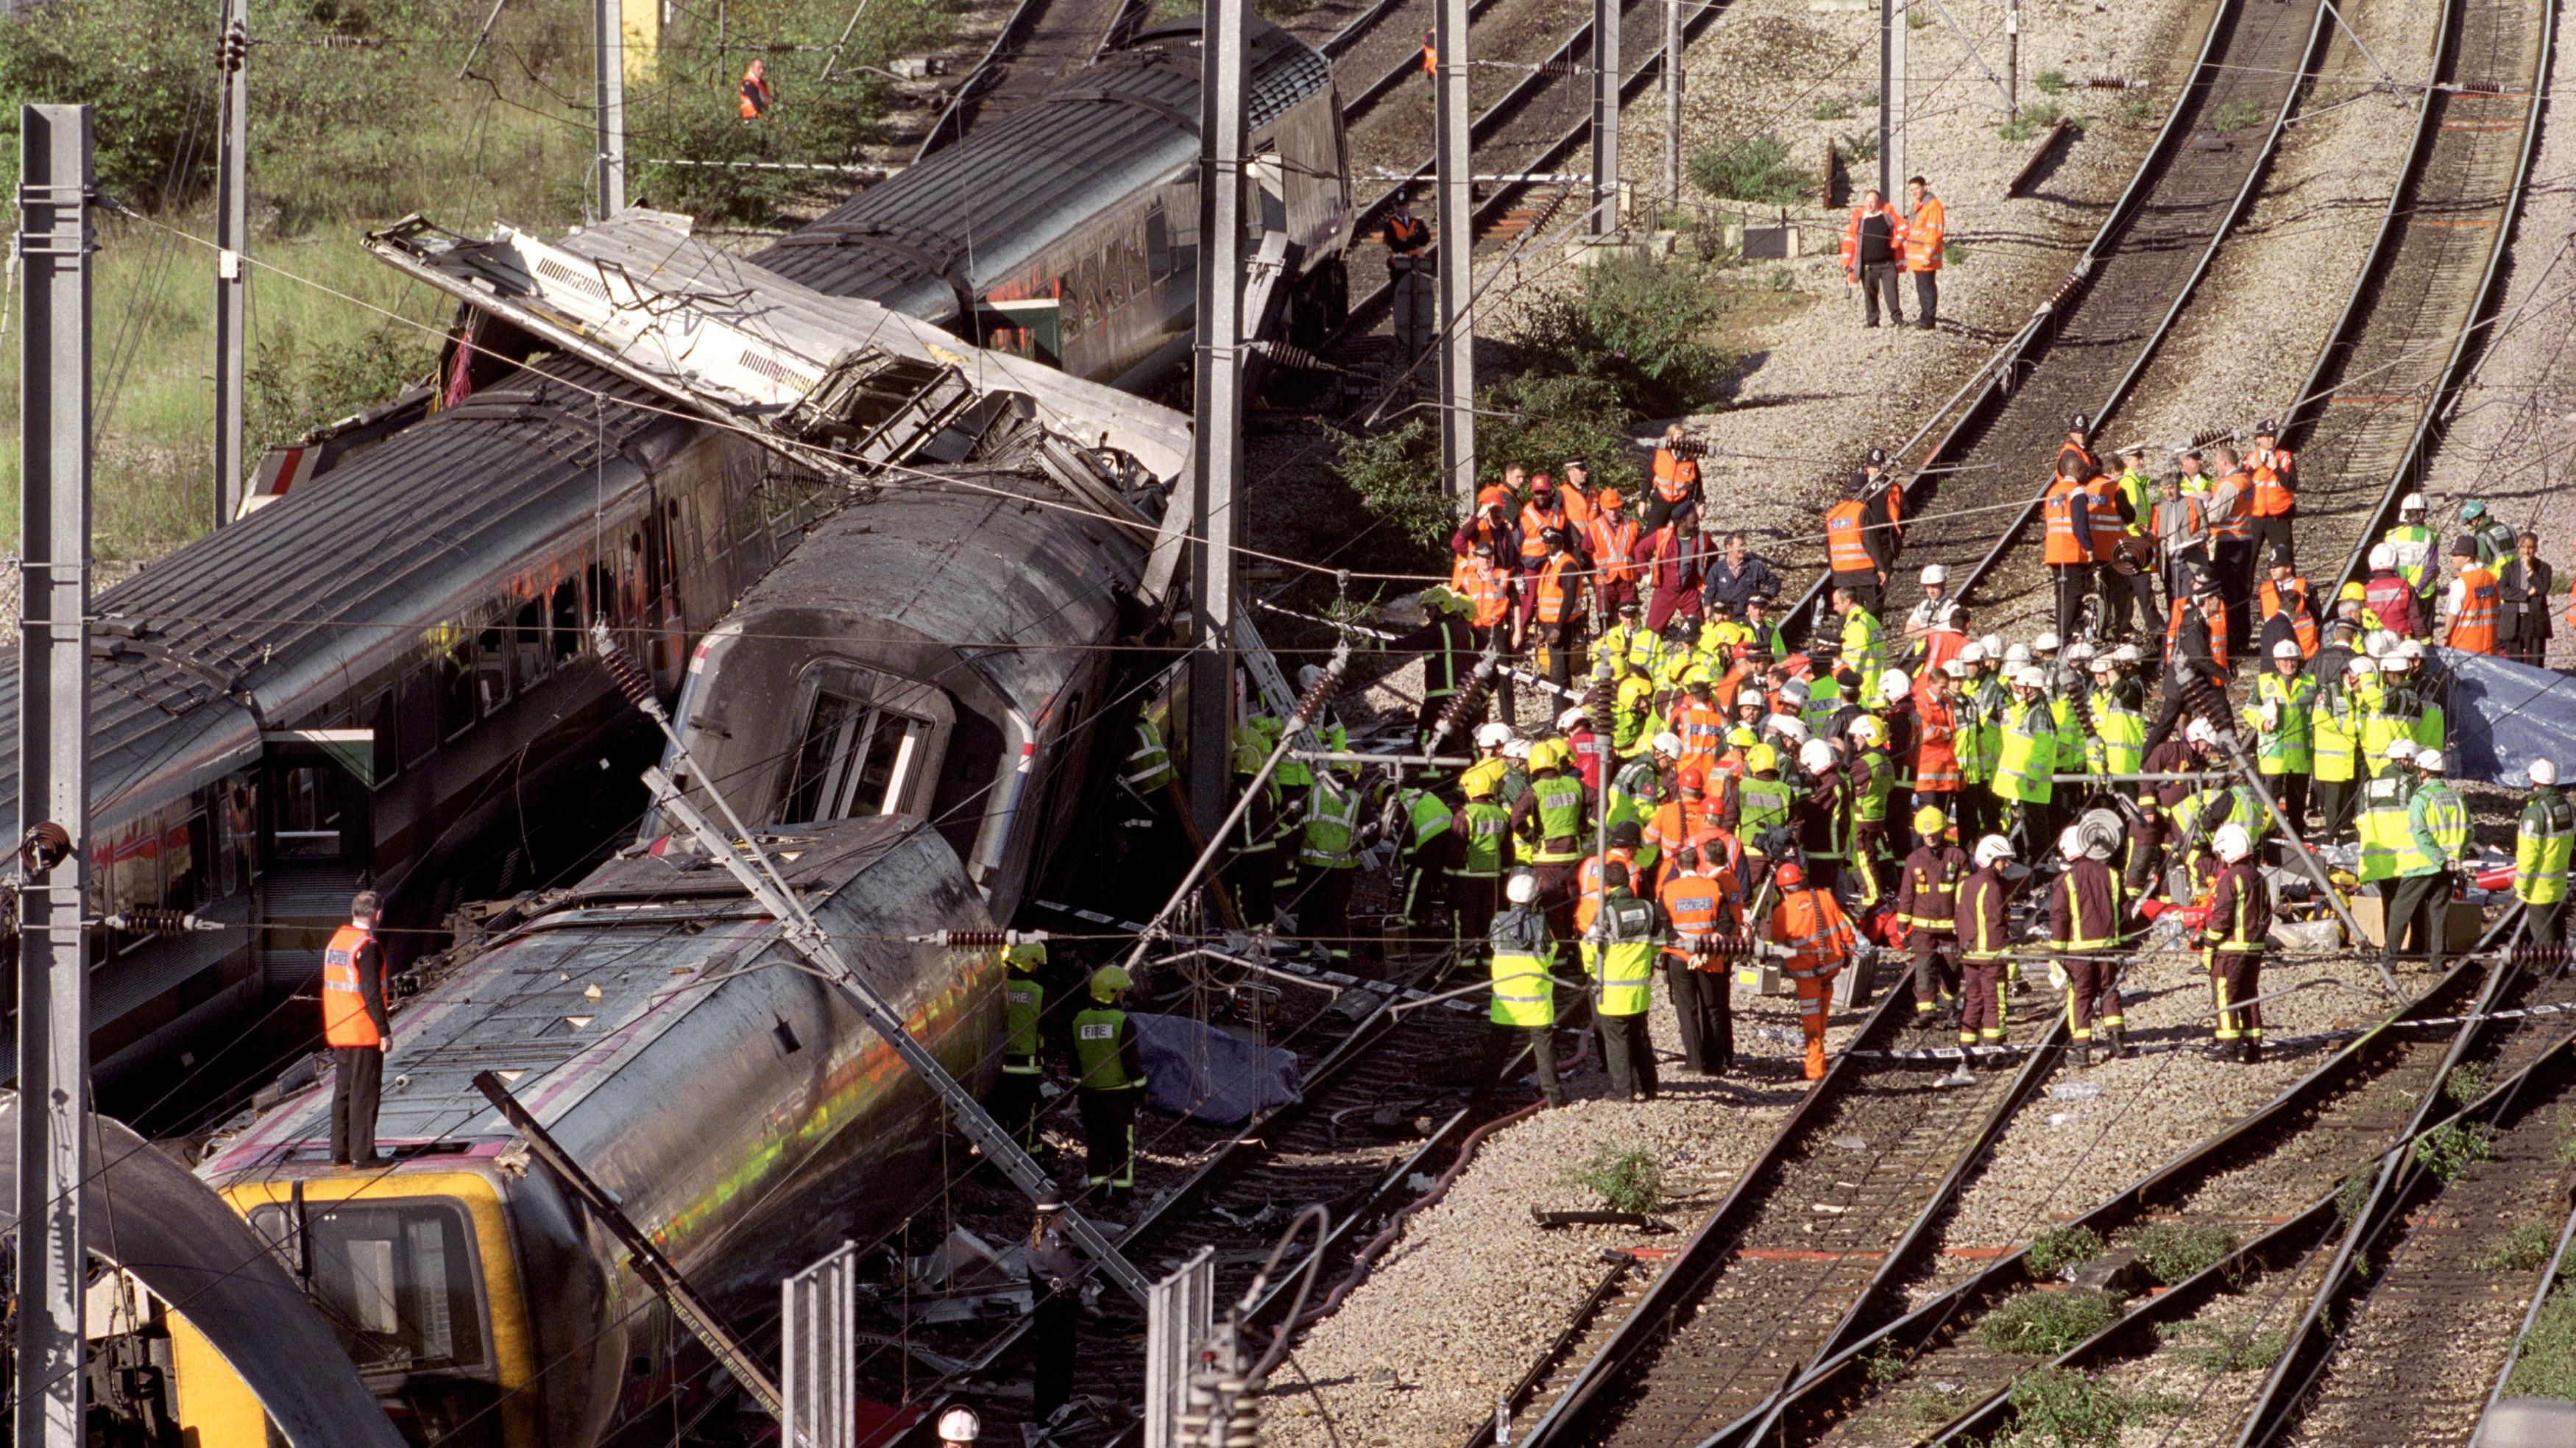 Paddington Rail Crash Survivors Mark 15th Anniversary